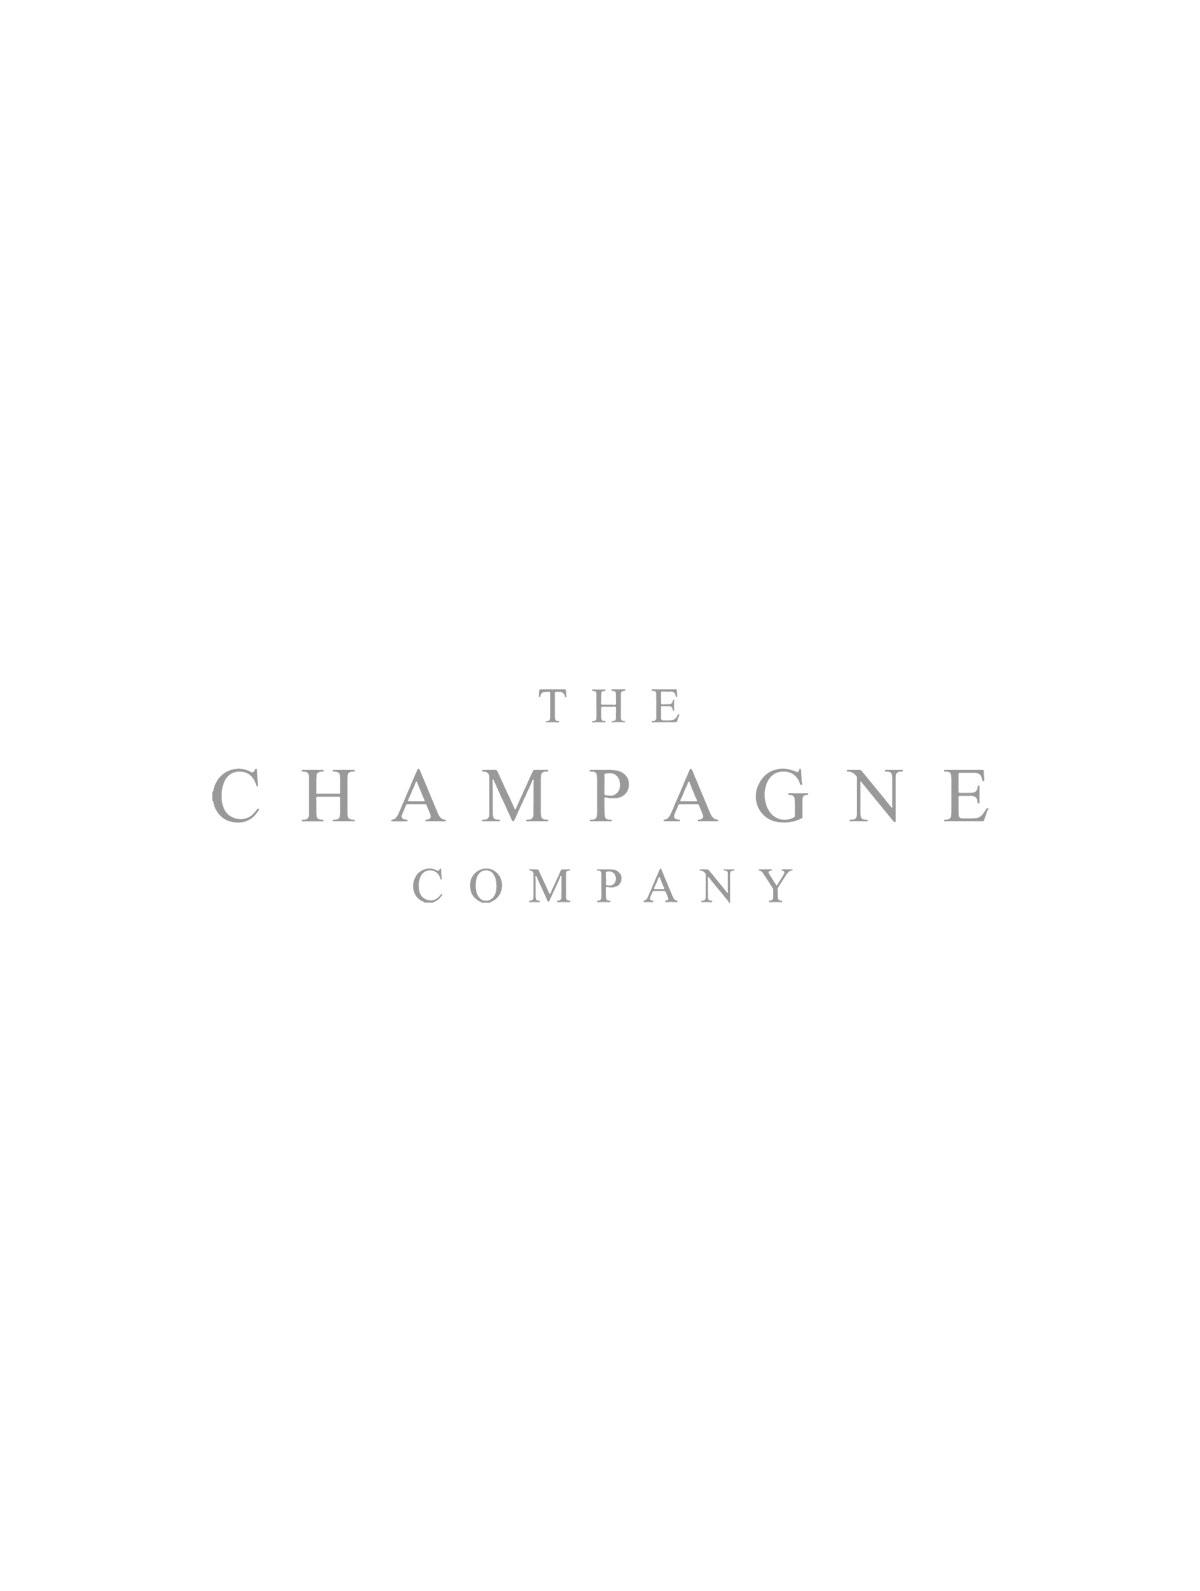 Dom Perignon Rose 1992 Plenitude P2 Vintage Champagne 75cl Gift Boxed